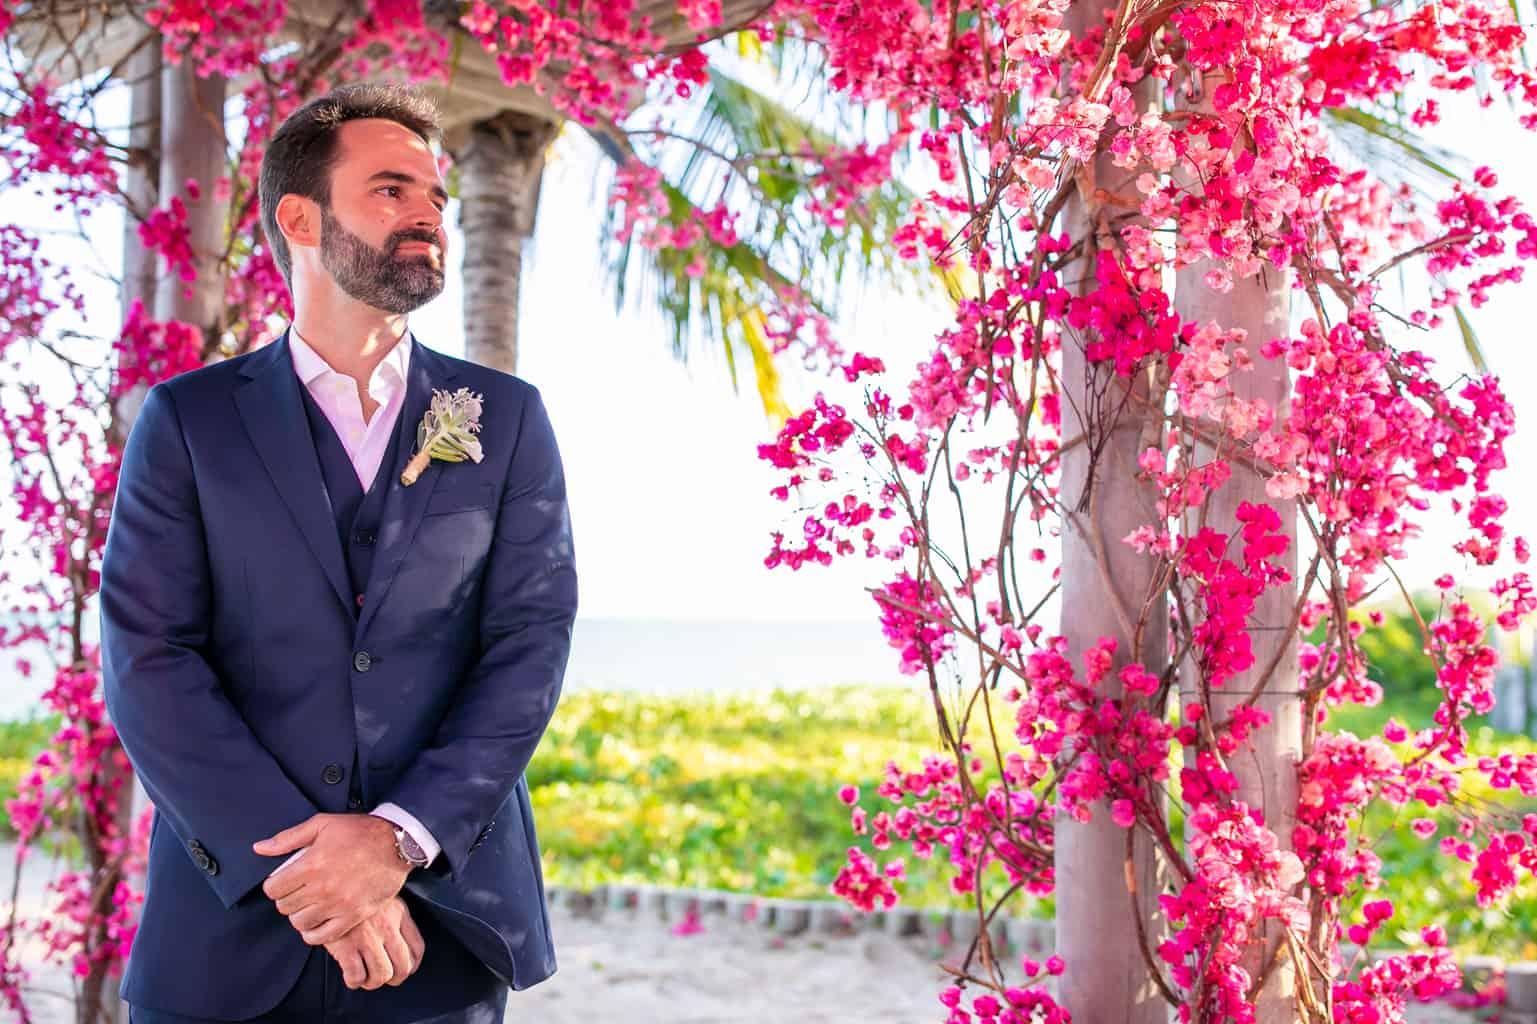 casamento-Taina-e-Hugo-Itapororoca-Villa-Trancoso-Patricia-Galvao-Sotter-Fotografia-Cerimonia-na-praia547